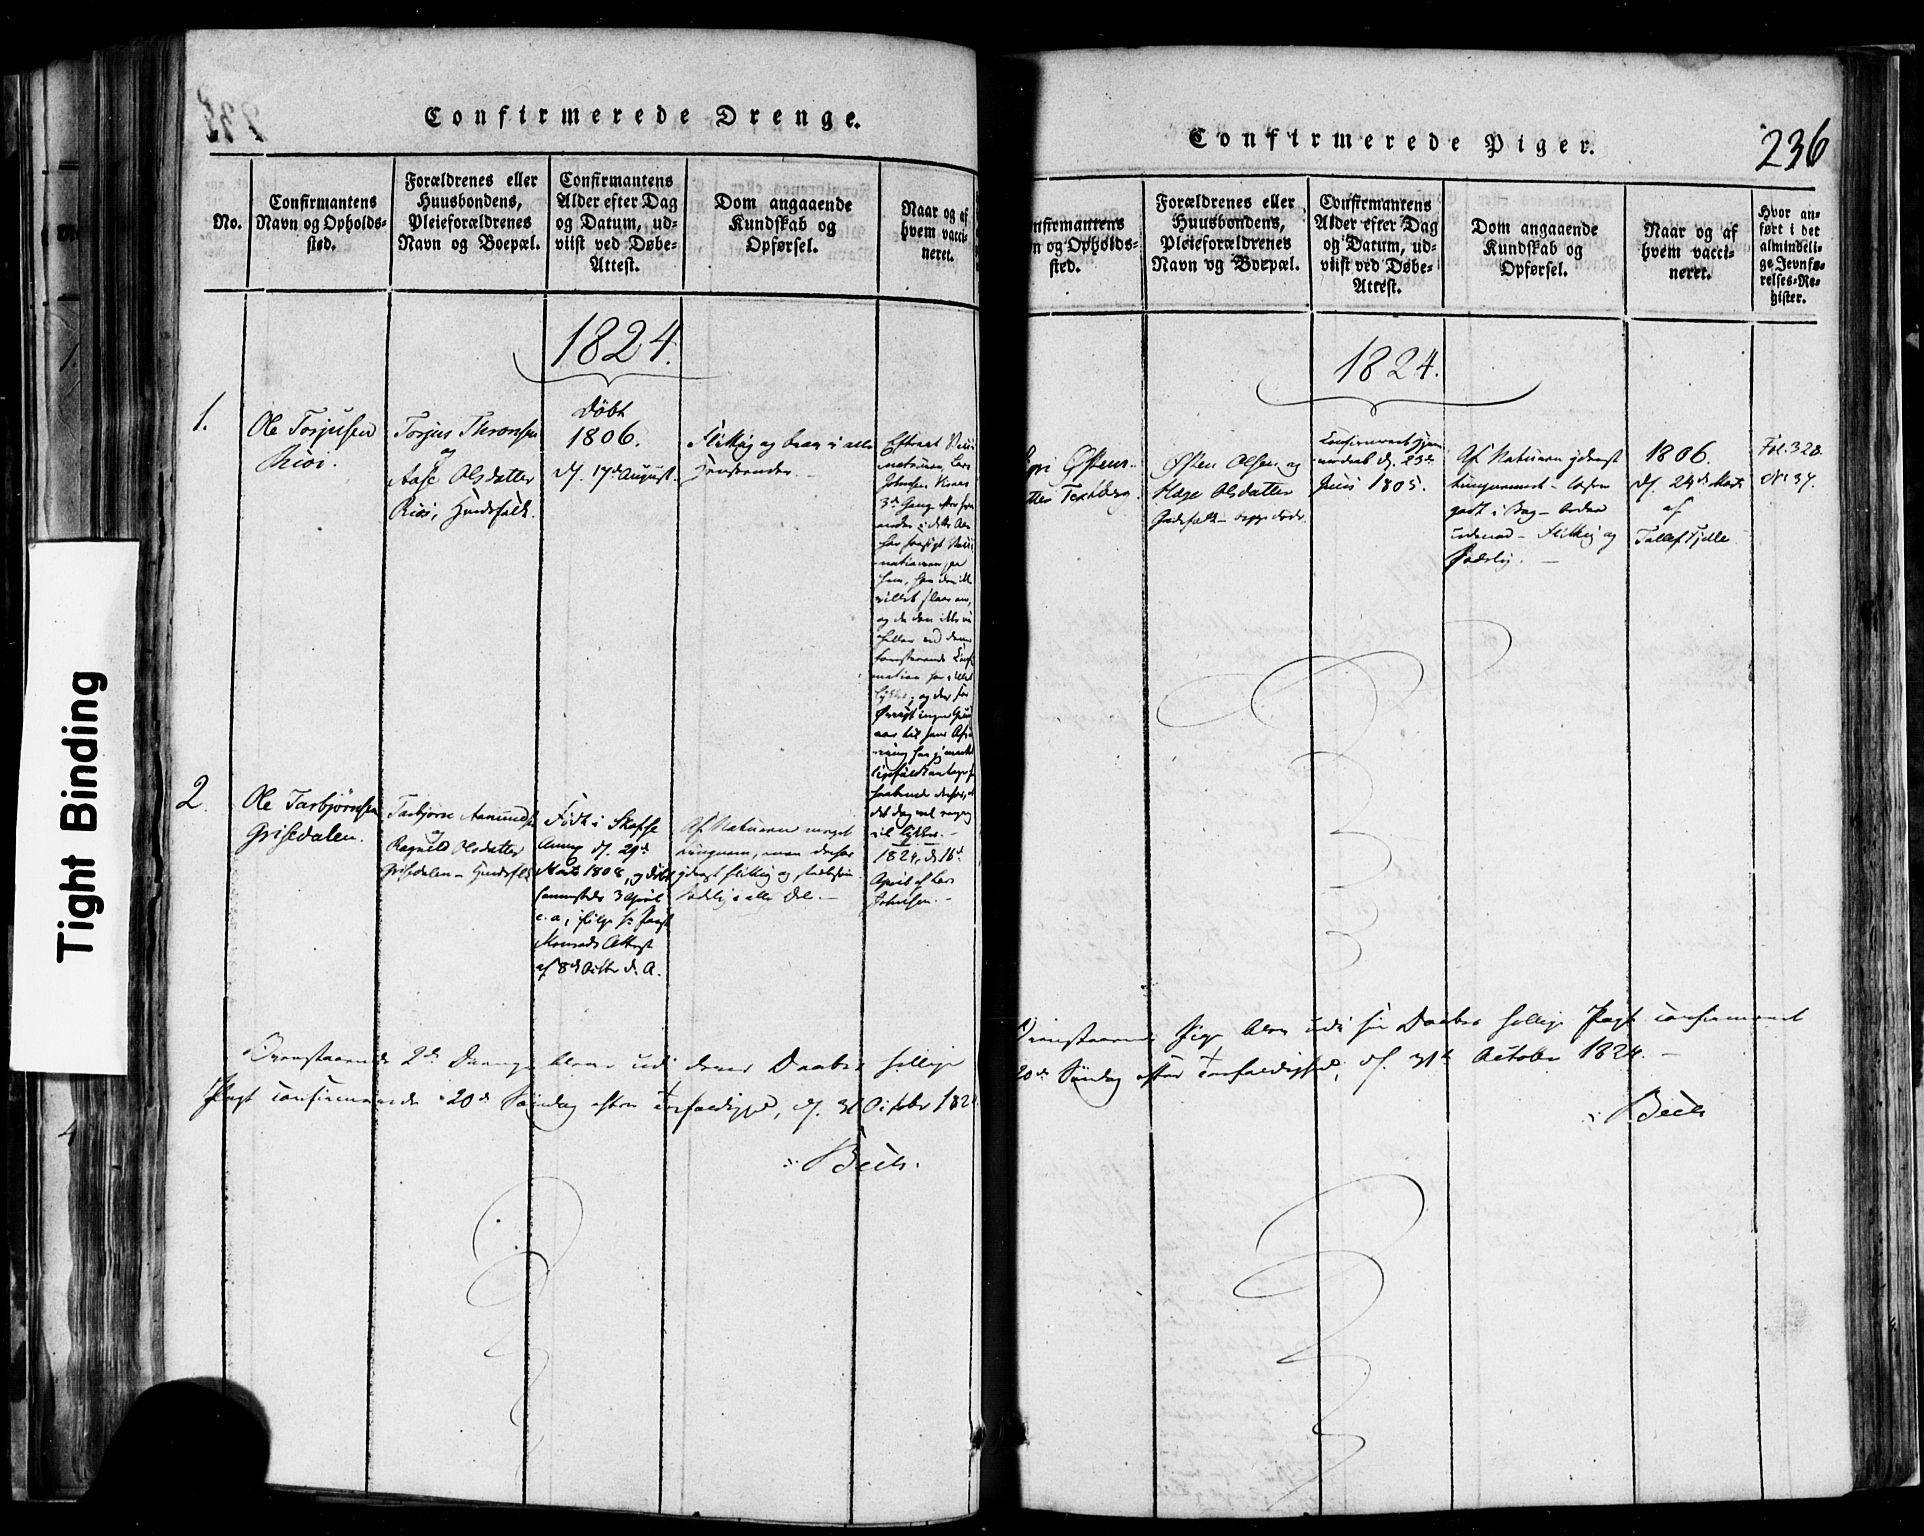 SAKO, Rauland kirkebøker, F/Fa/L0002: Ministerialbok nr. 2, 1815-1860, s. 236